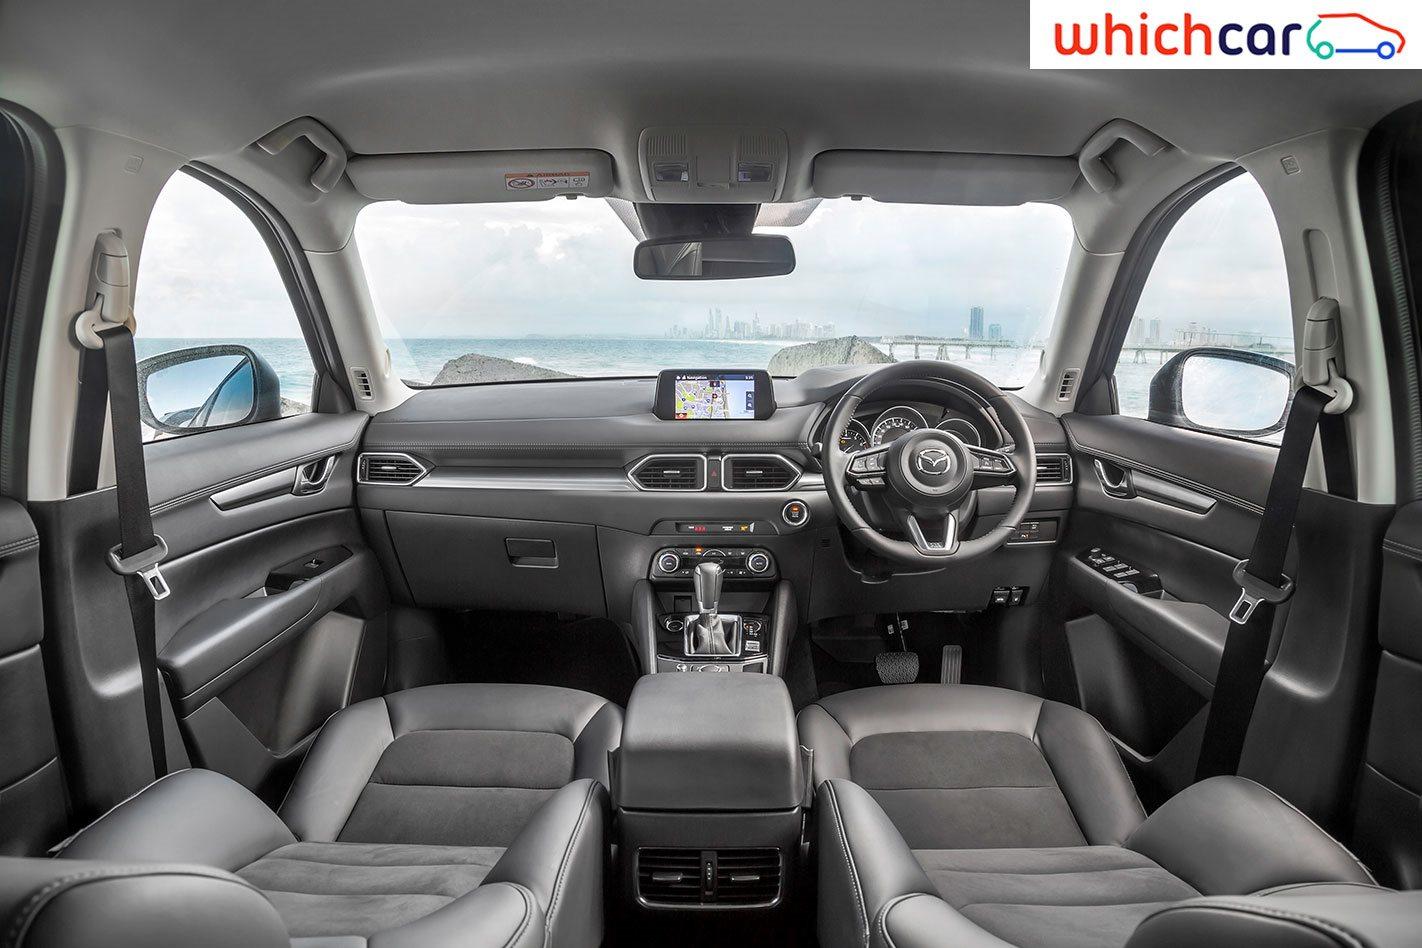 mazda cx-5 2019 range review | price, features & specs